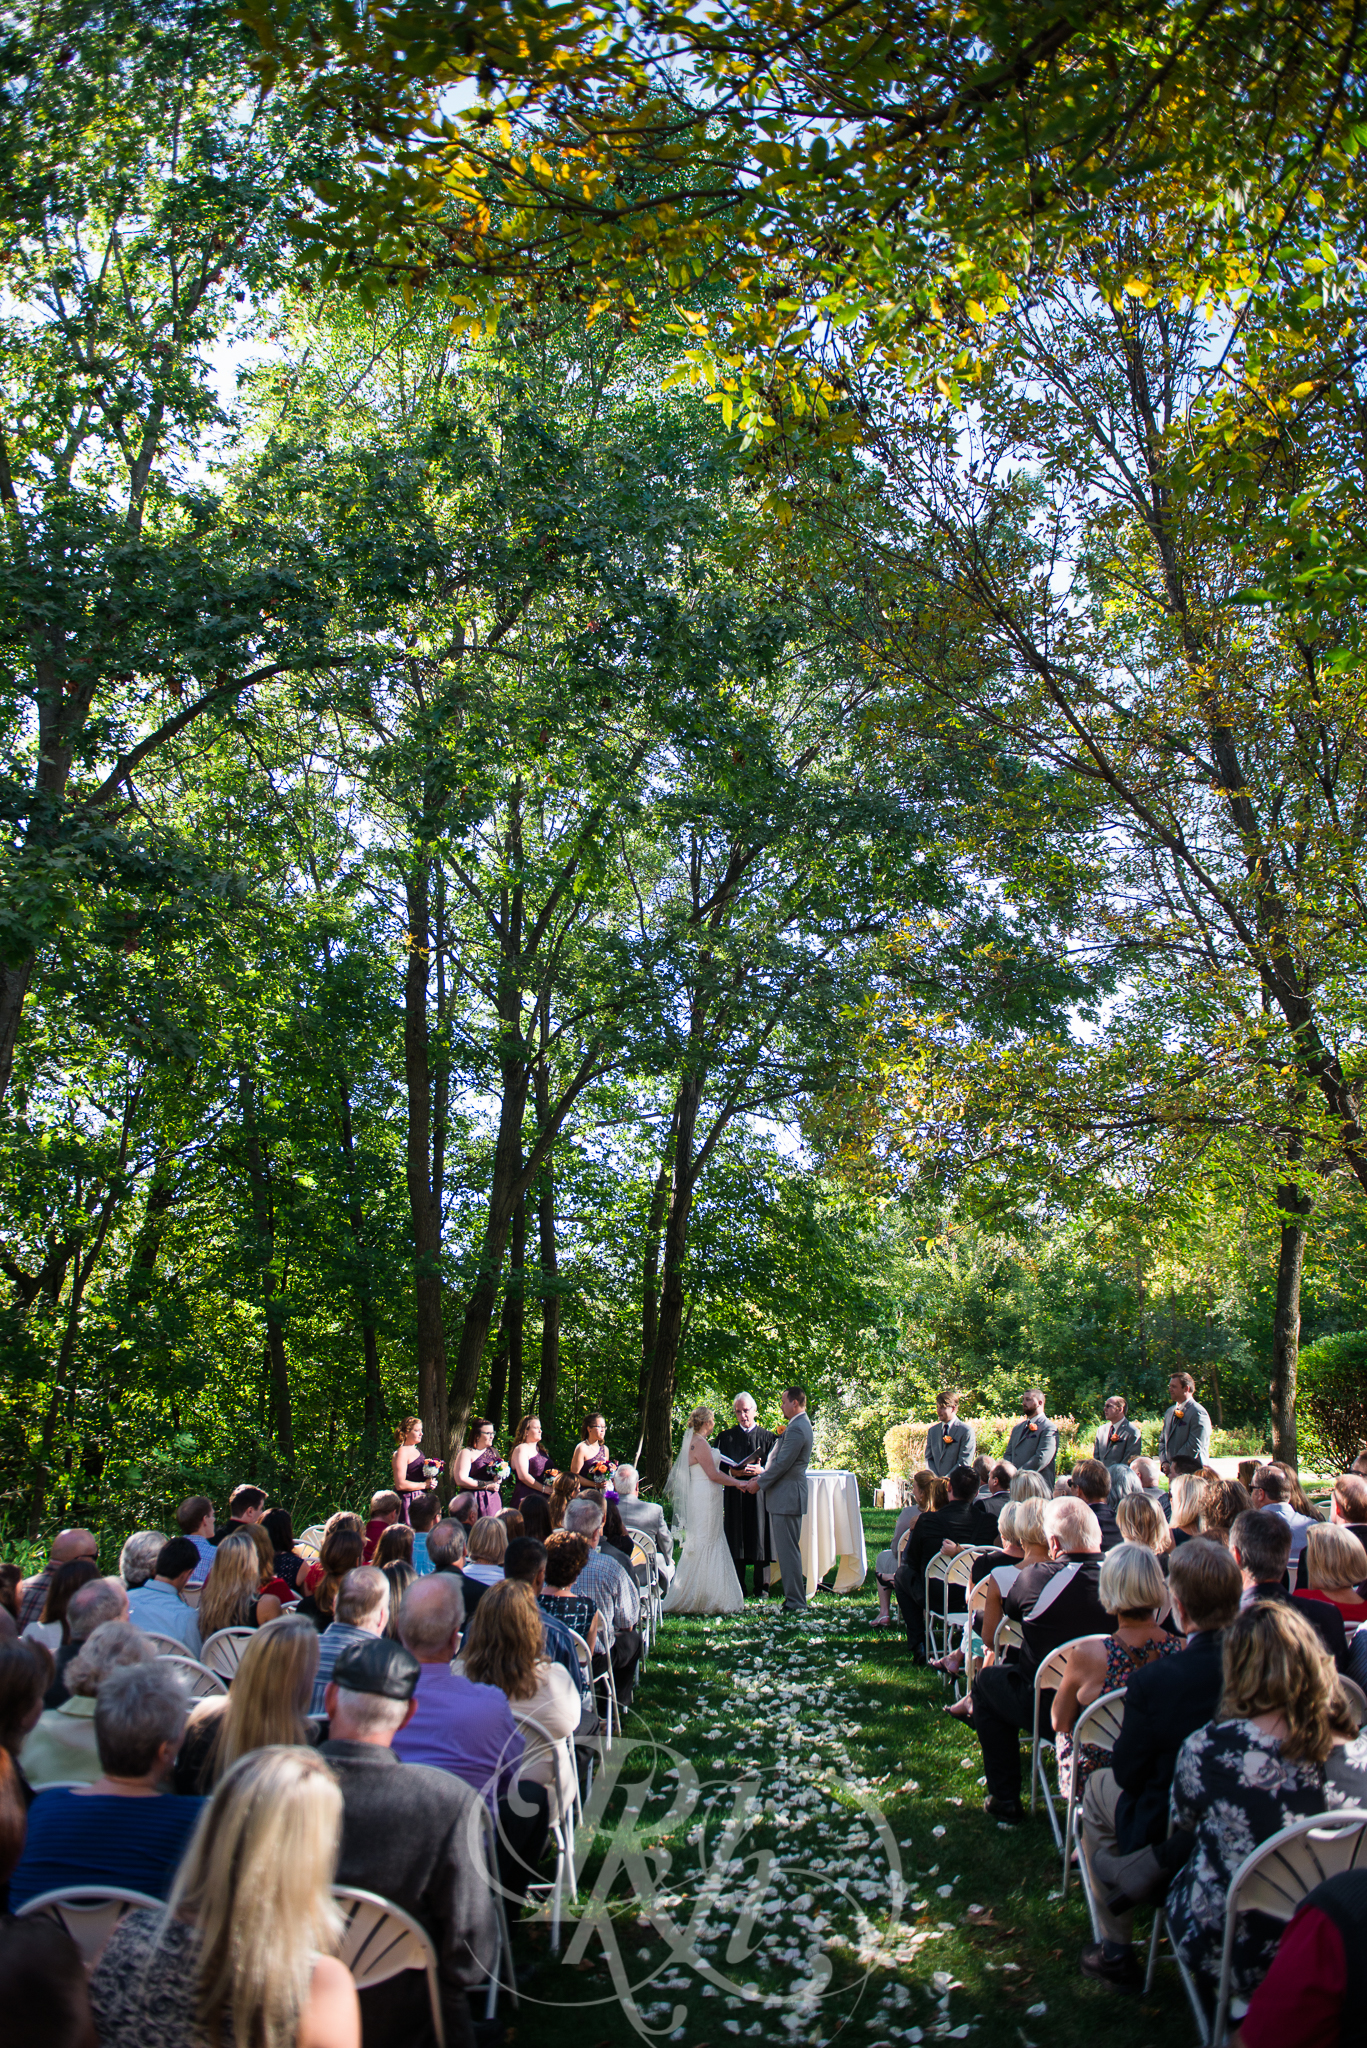 Jackie & Corey - Minnesota Wedding Photography - RKH Images -13.jpg